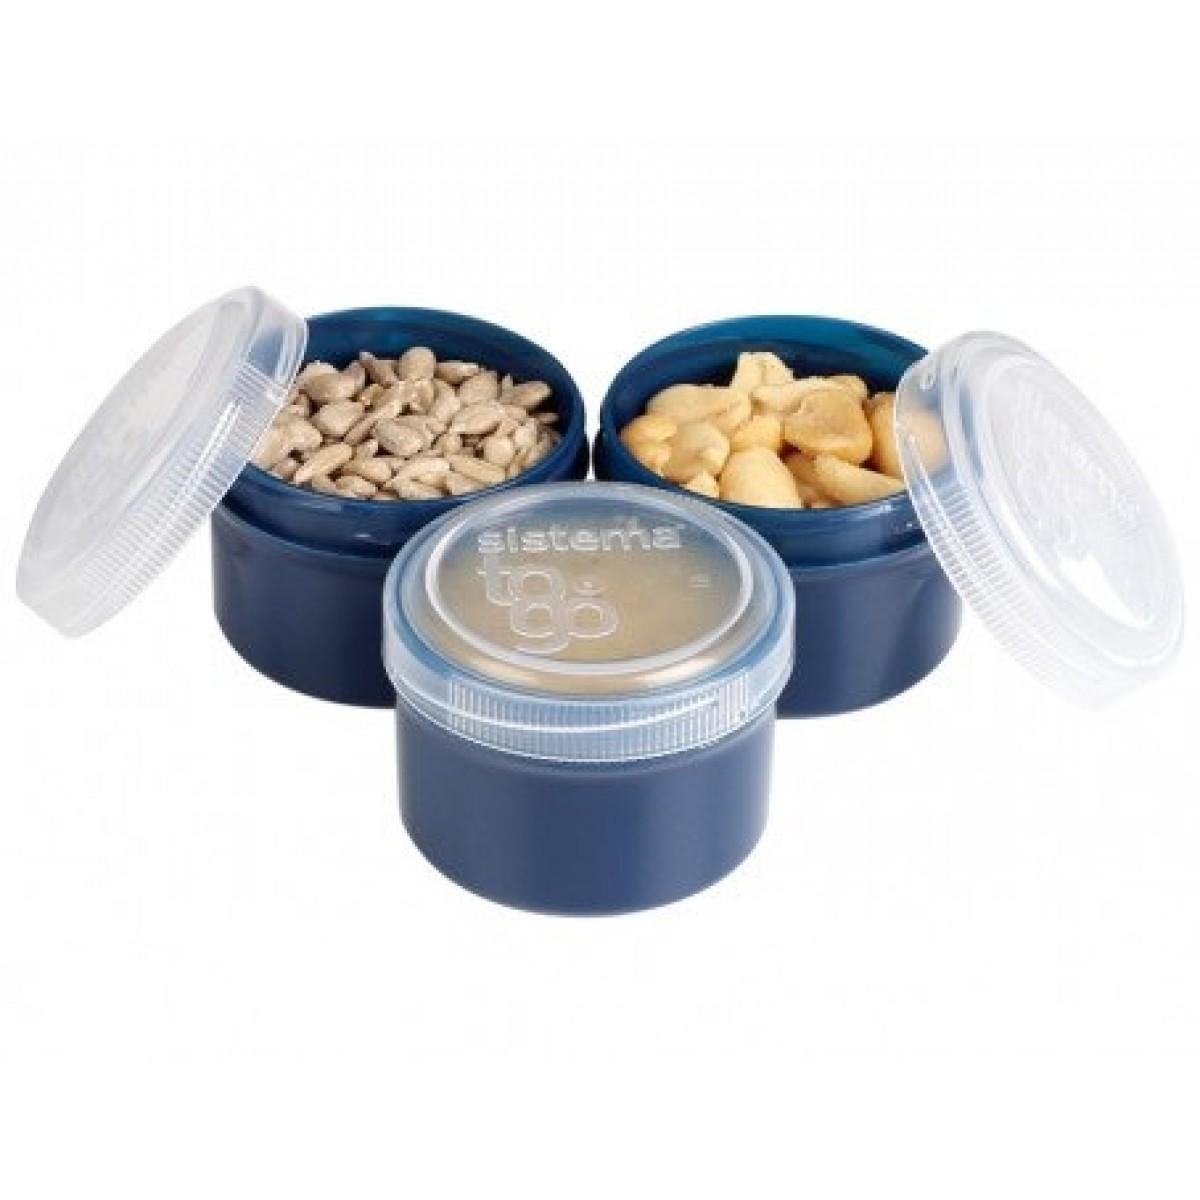 SISTEMA Mini bokse renew 3 stk - blå